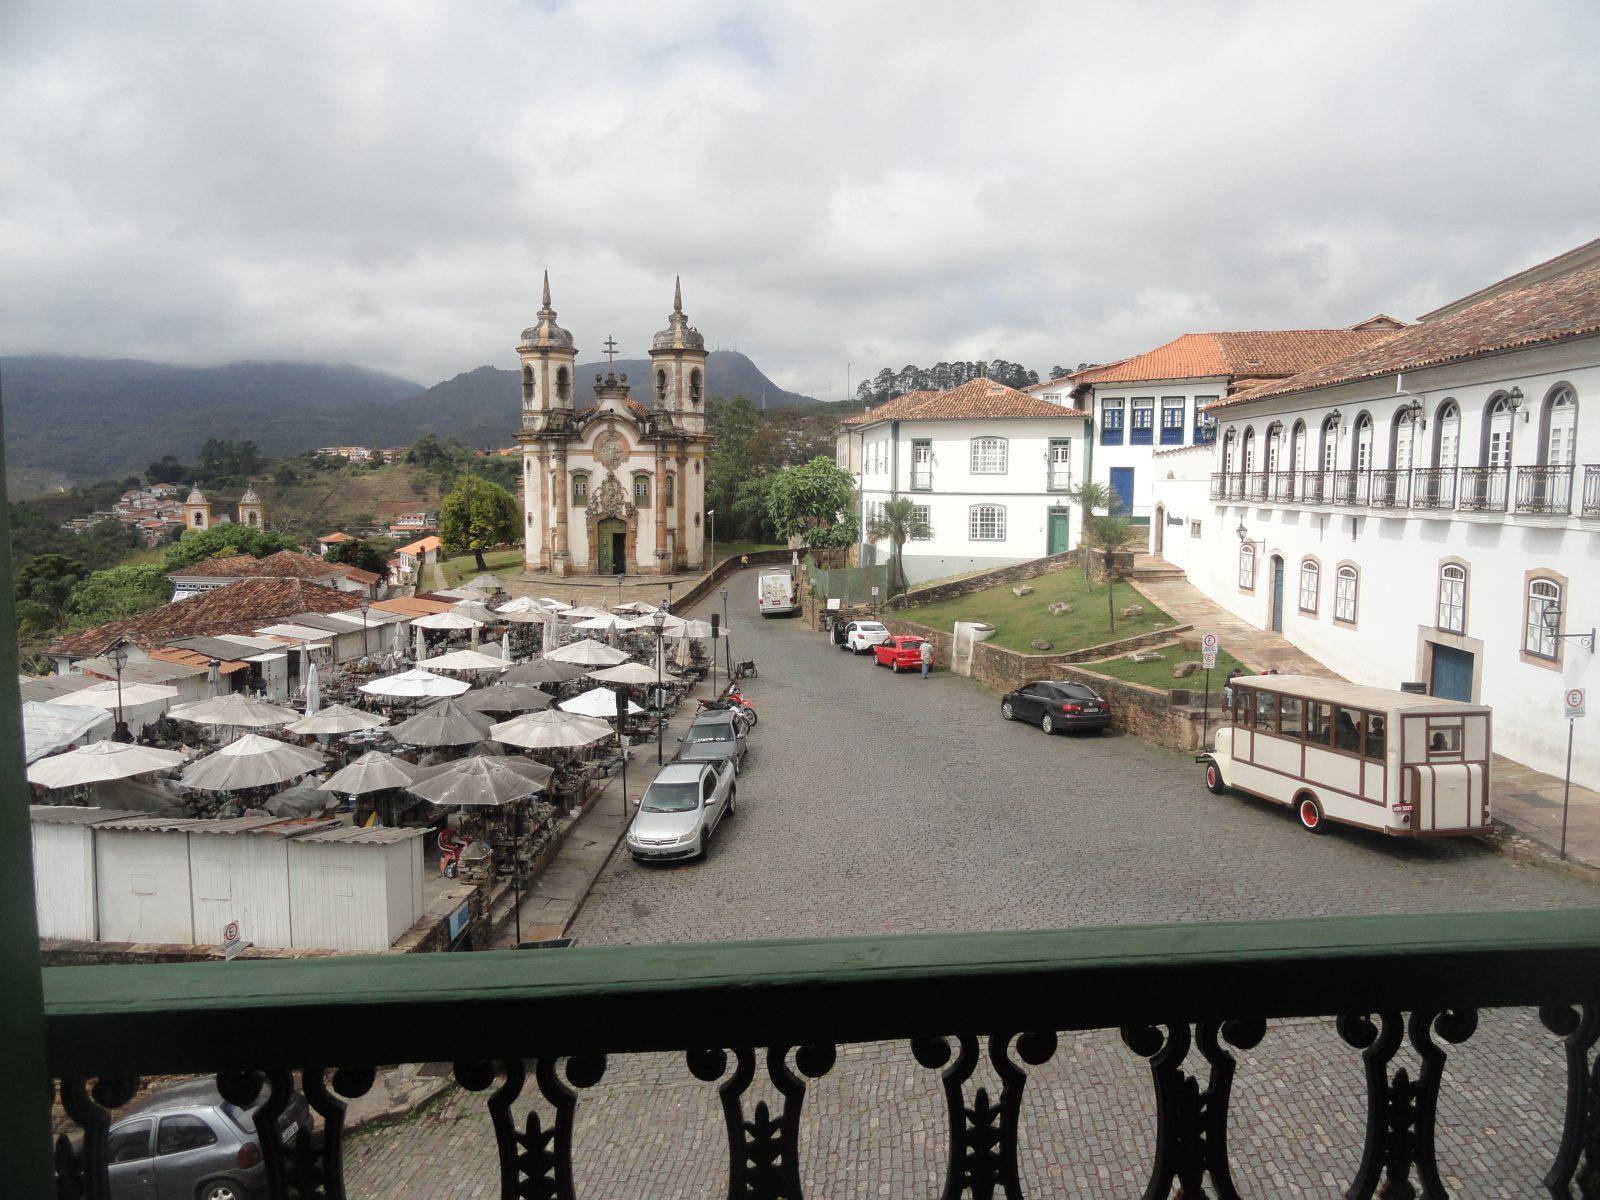 Inconfidência_Mineira_Maria_Dorotéa _Marília_Dirceu_Seixas_Patrimônio_estrada real_Unesco_Iphan